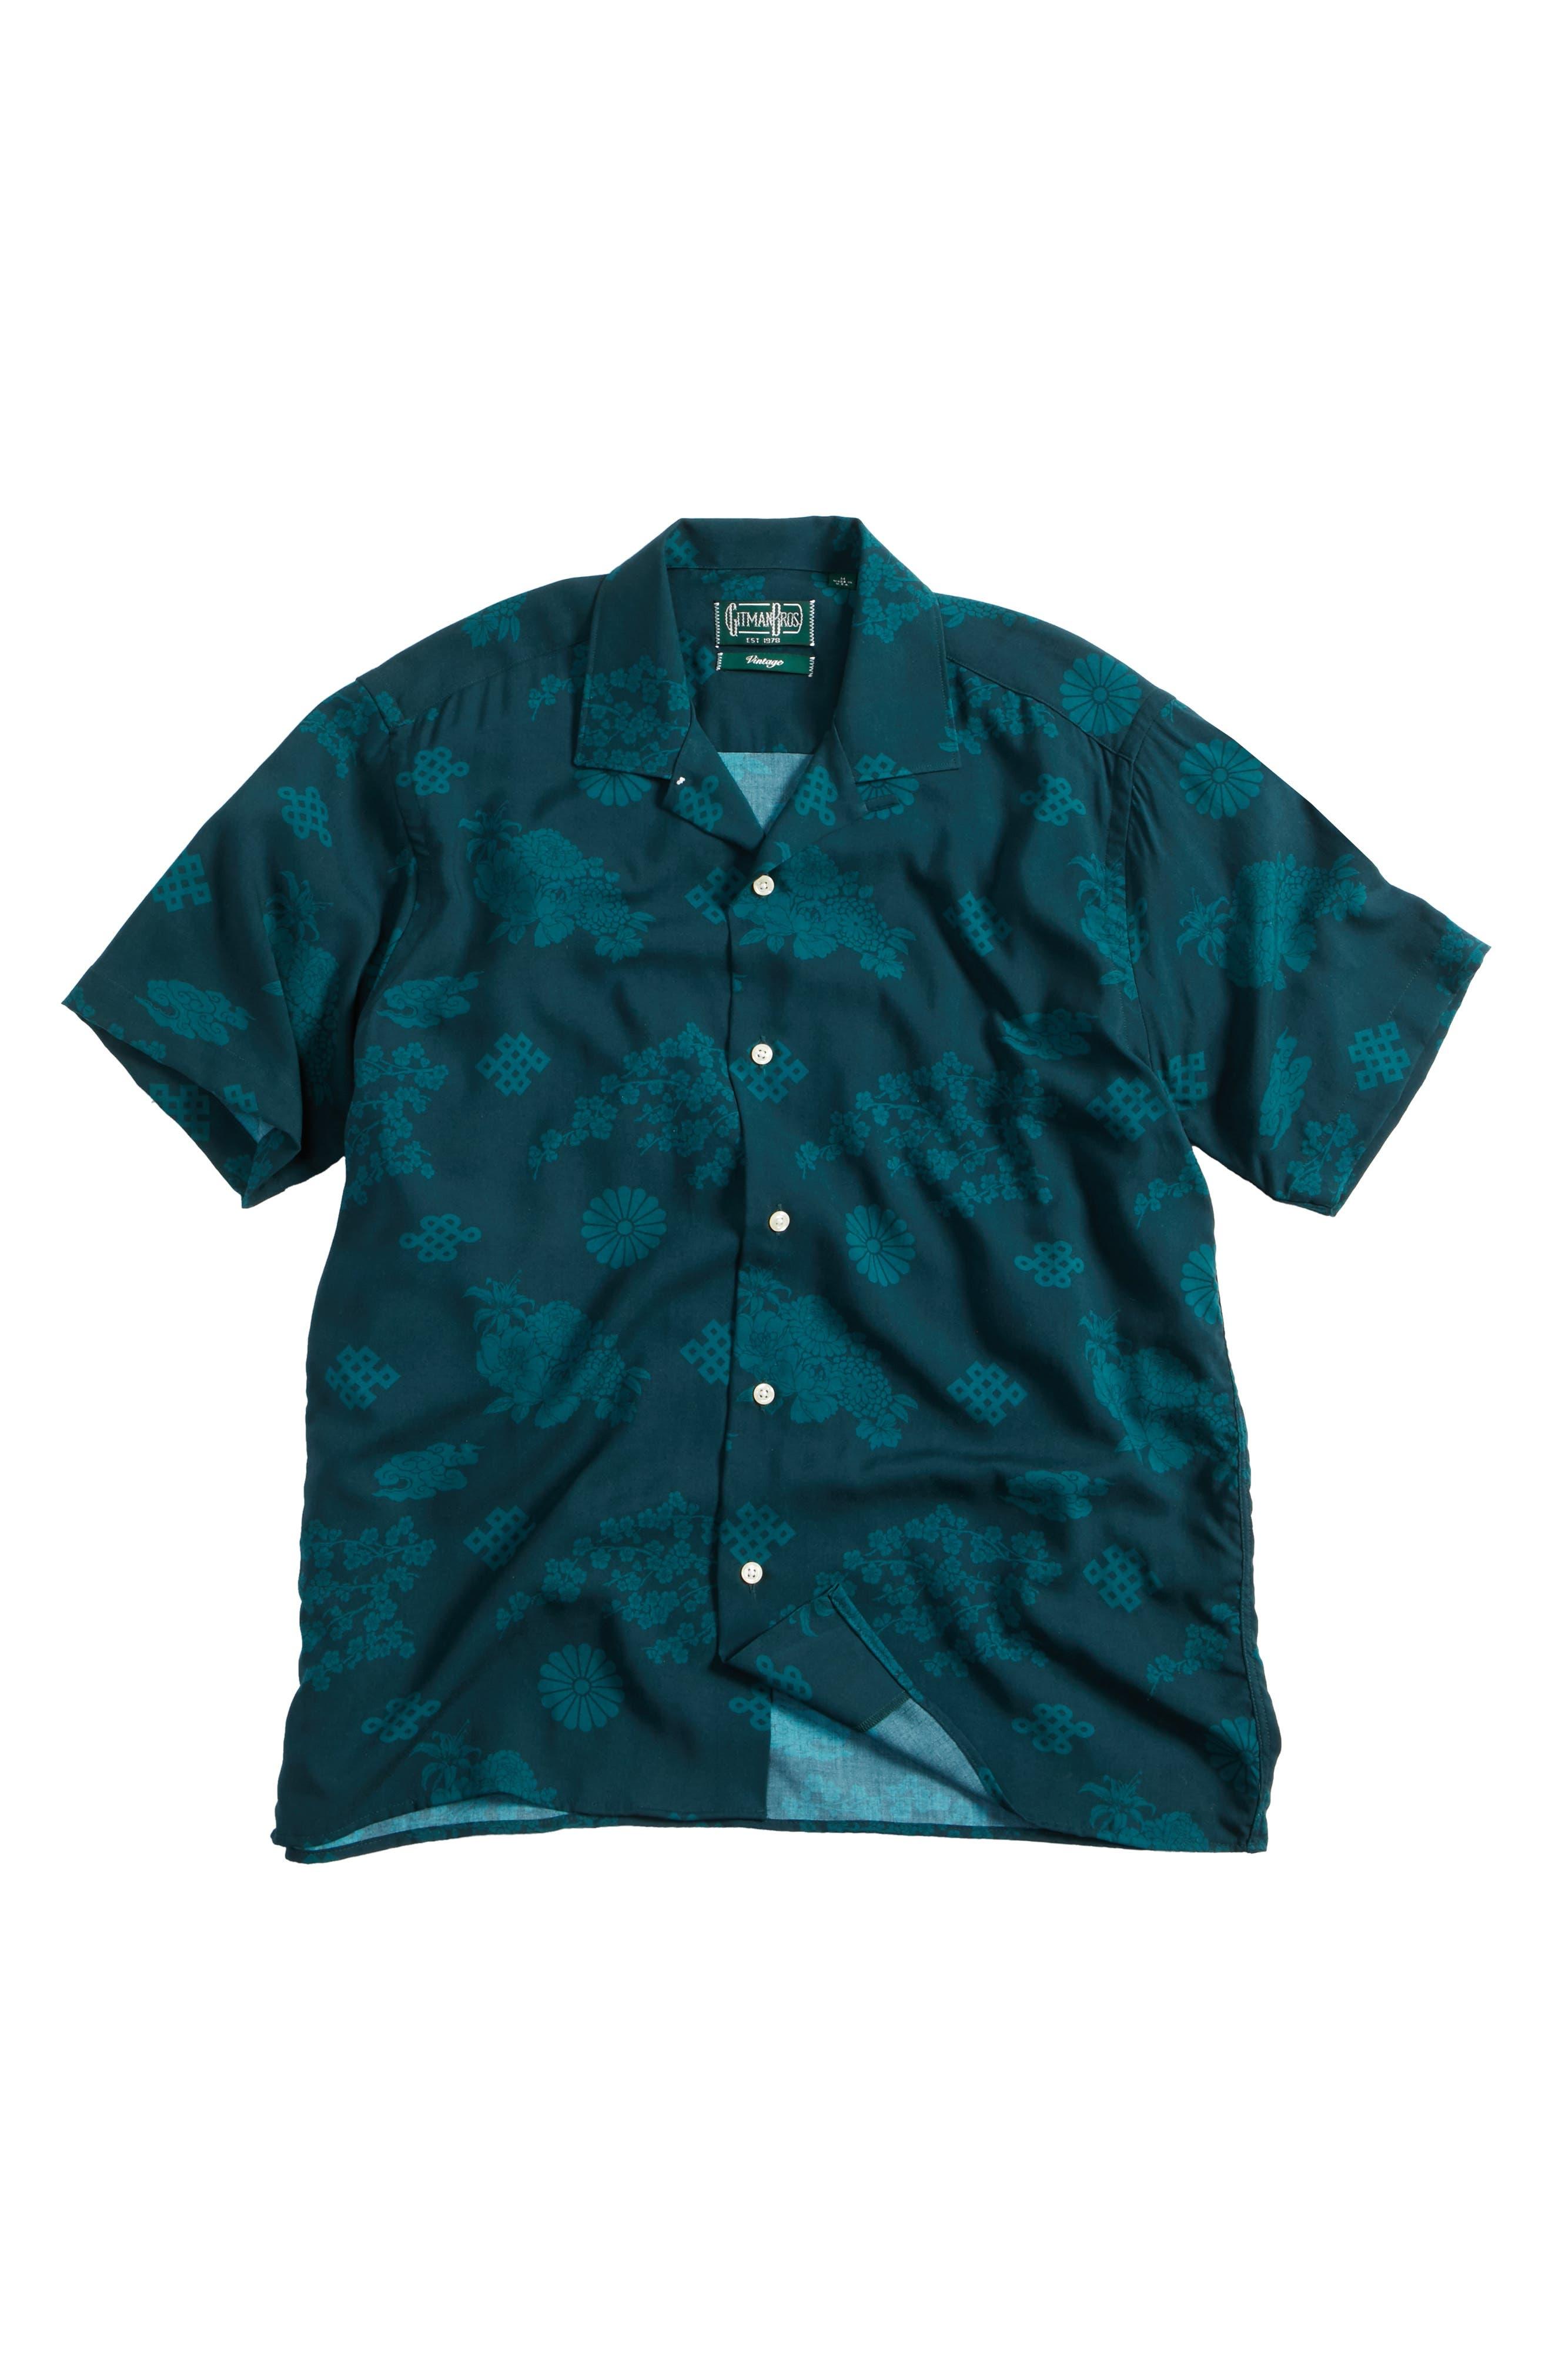 x The North Face Men's Floral Print Camp Shirt,                         Main,                         color, 300